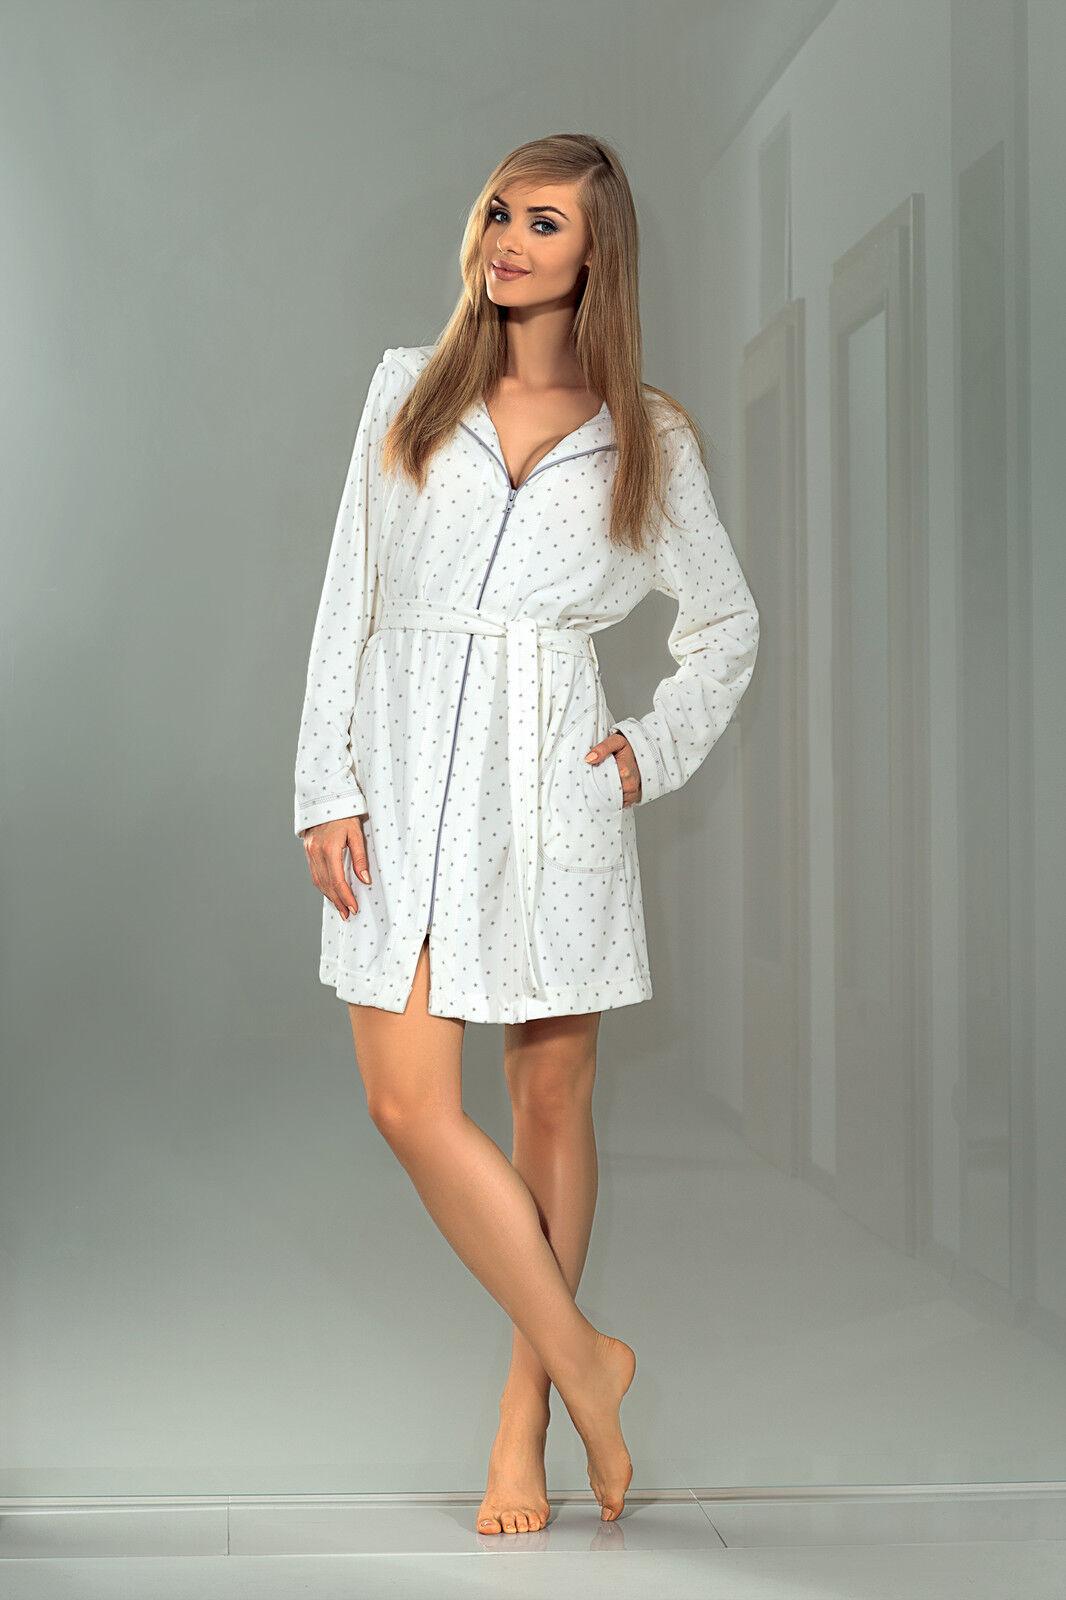 Women Luxury SOFT Bath Robe Dressing Gown Bathrobe with Zipper, Hood ...